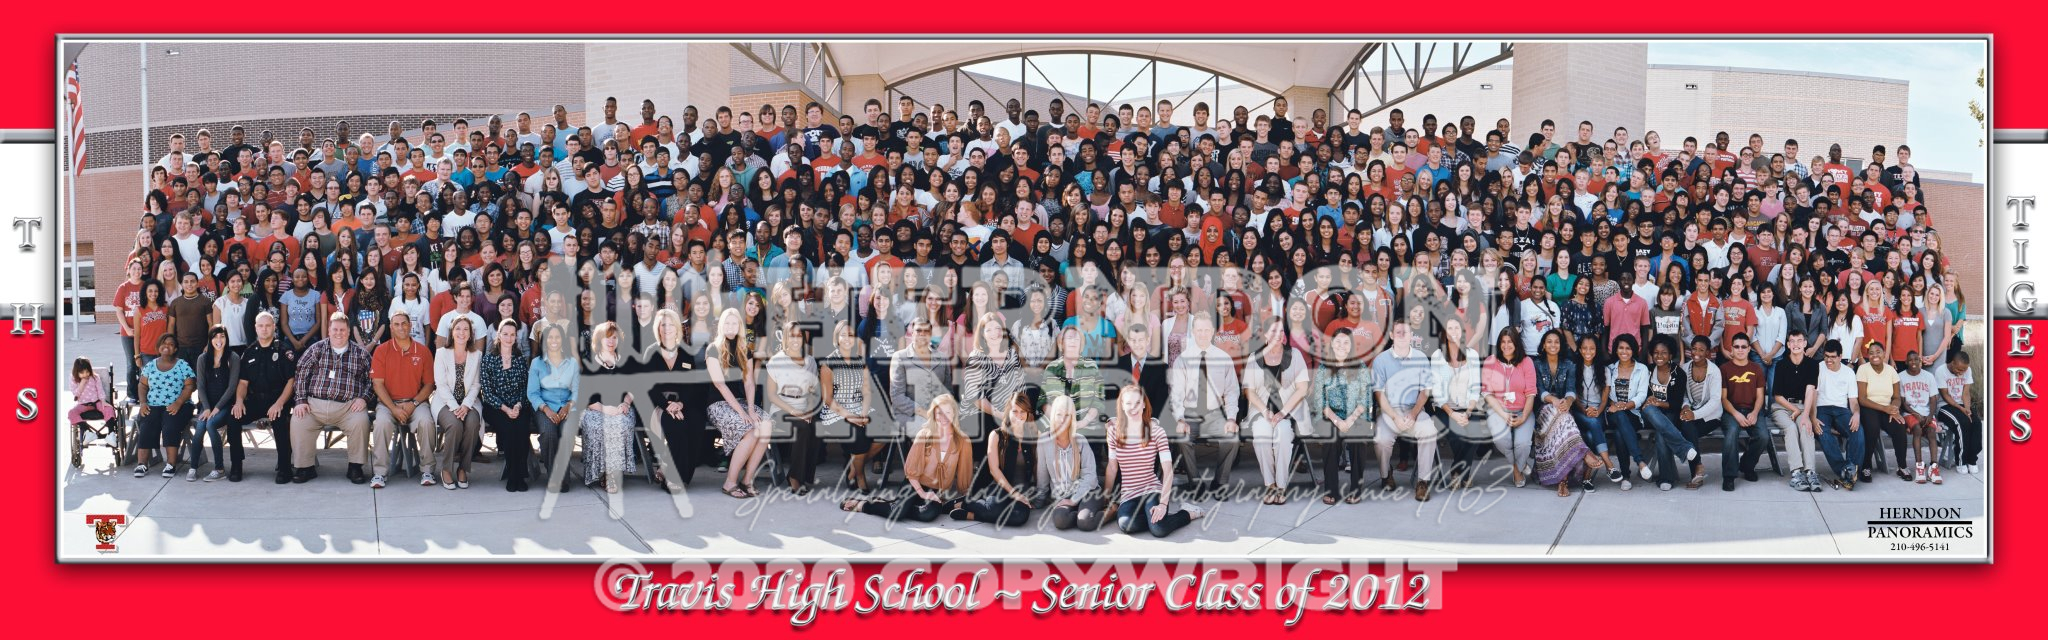 Travis-High-School